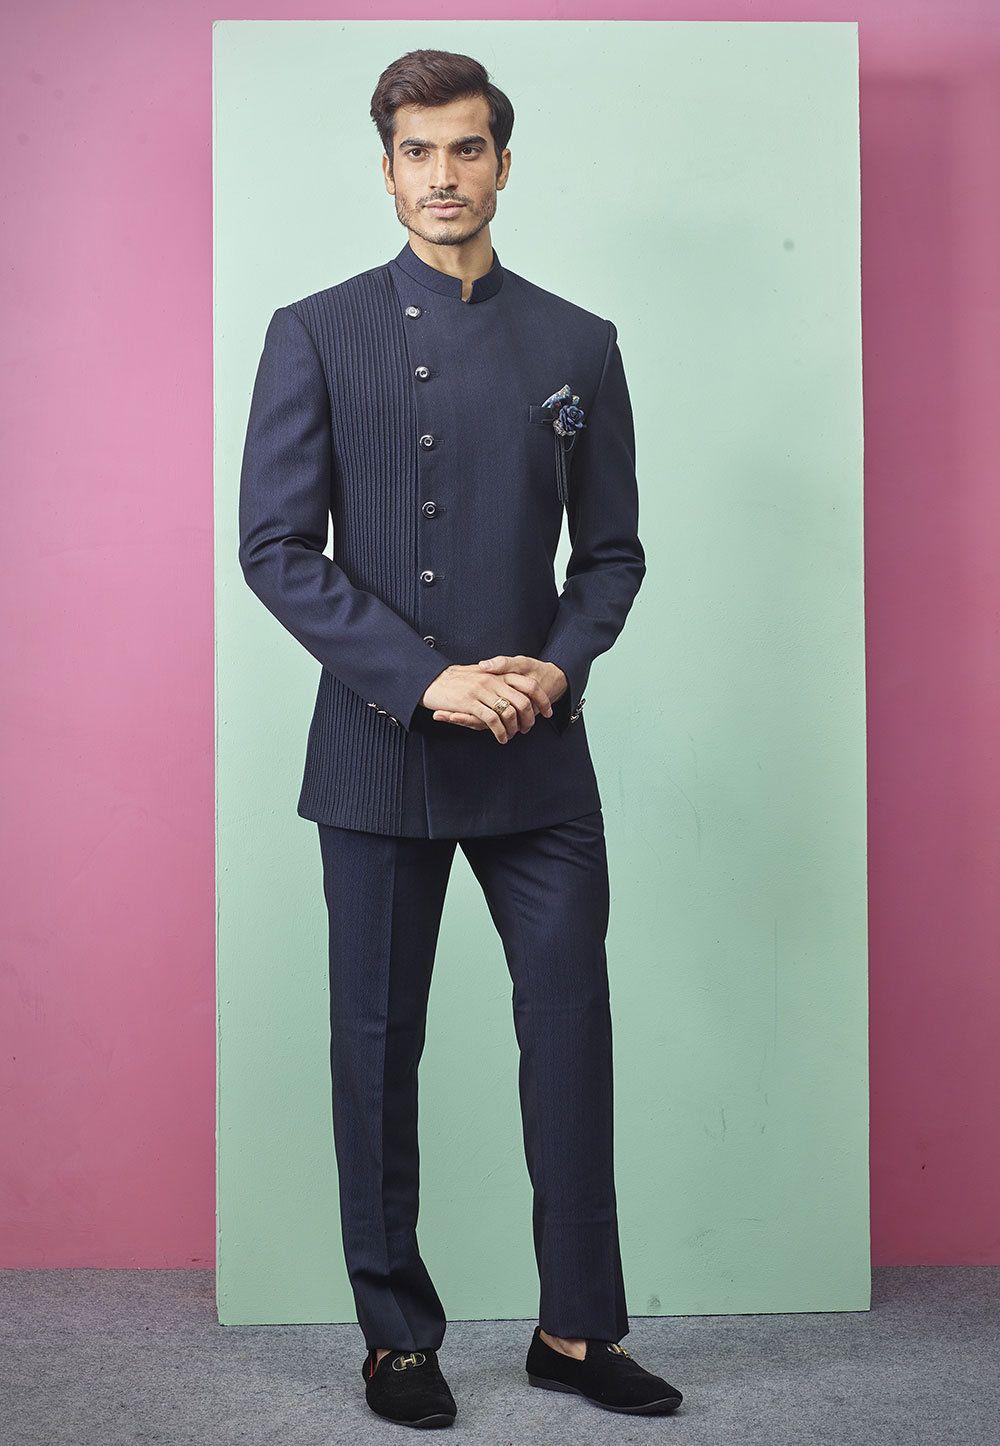 Indian Jodhpuri Suitmens Suitblue Jodhpuri Suitmens Wedding Etsy Jodhpuri Suits For Men Wedding Suits Men Fashion Suits For Men [ 1446 x 1000 Pixel ]